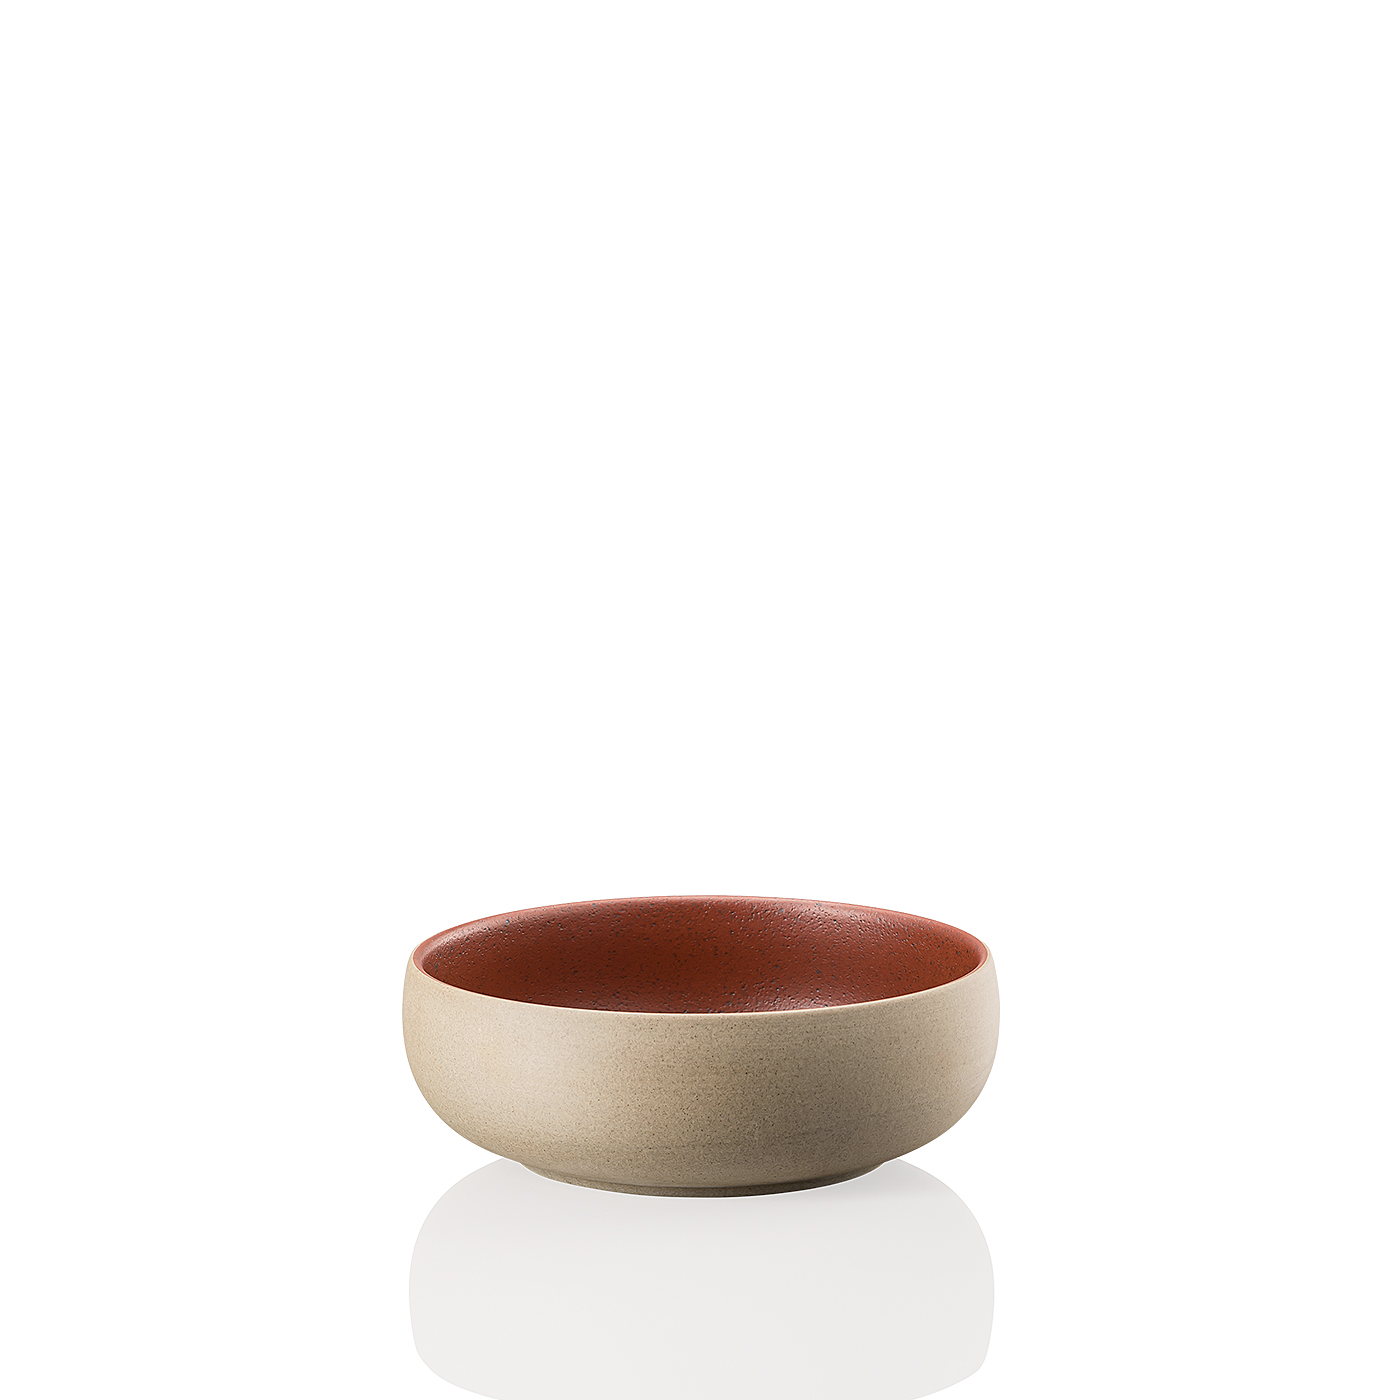 Bowl 16 cm Joyn Stoneware Spark Arzberg